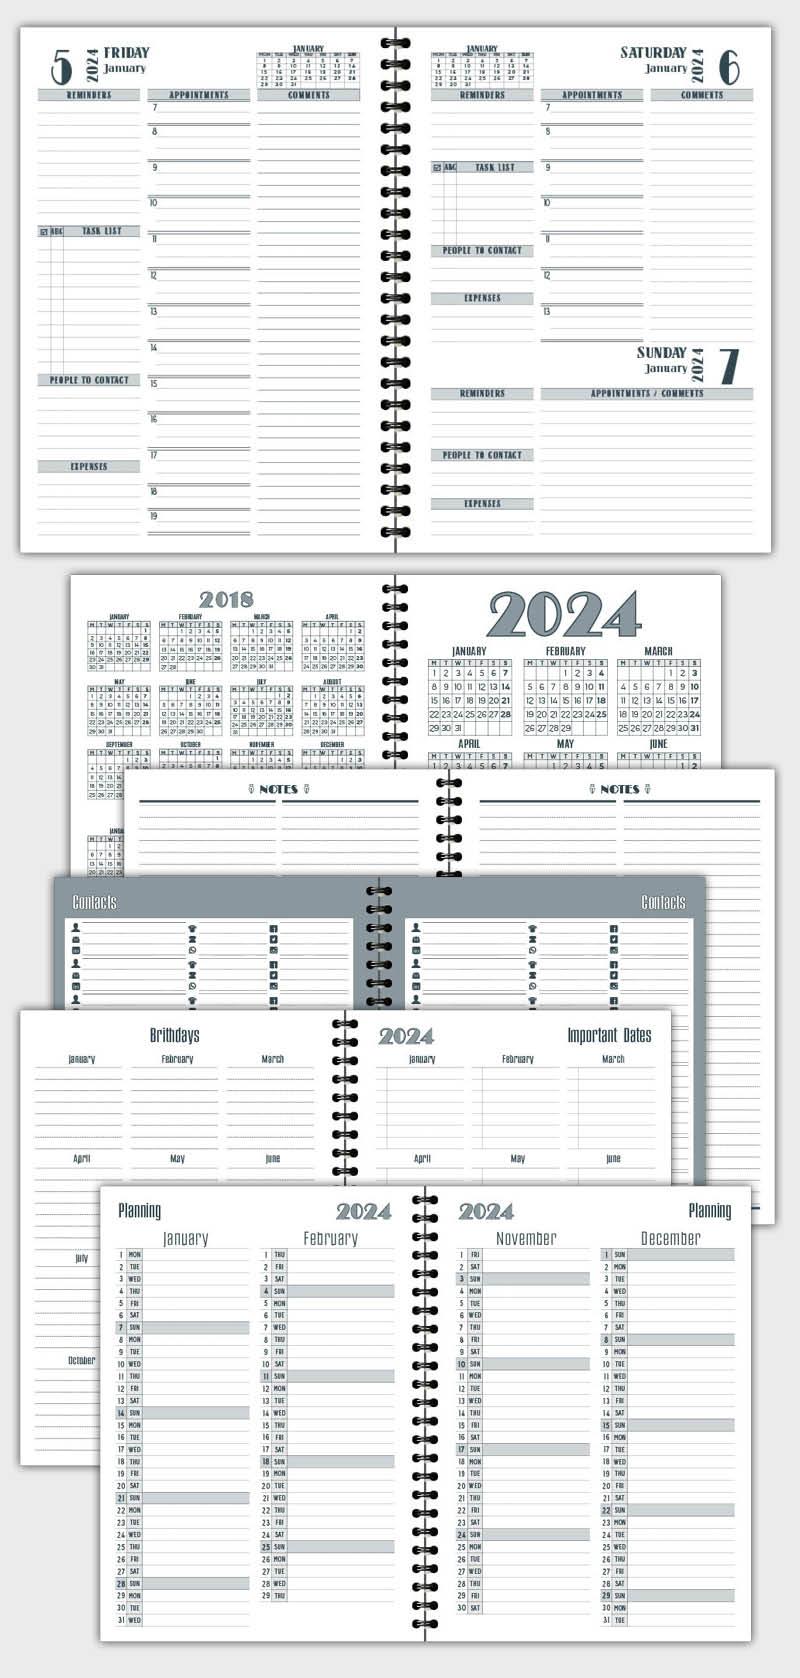 2021 DAILY PLANNER AGENDA TEMPLATE MODEL ATD75